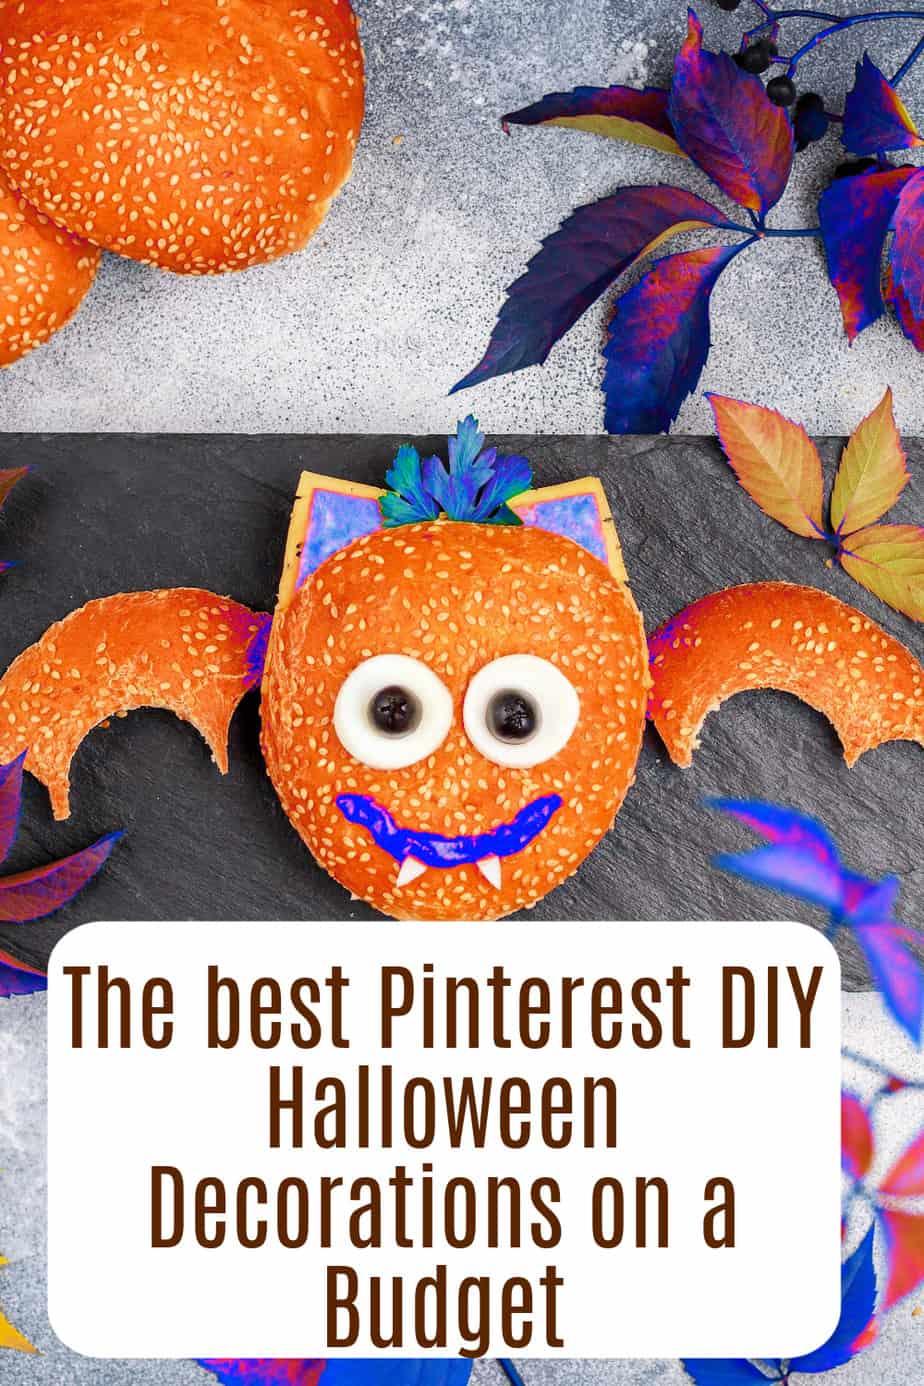 The Best Pinterest DIY Halloween Decorations on a Budget